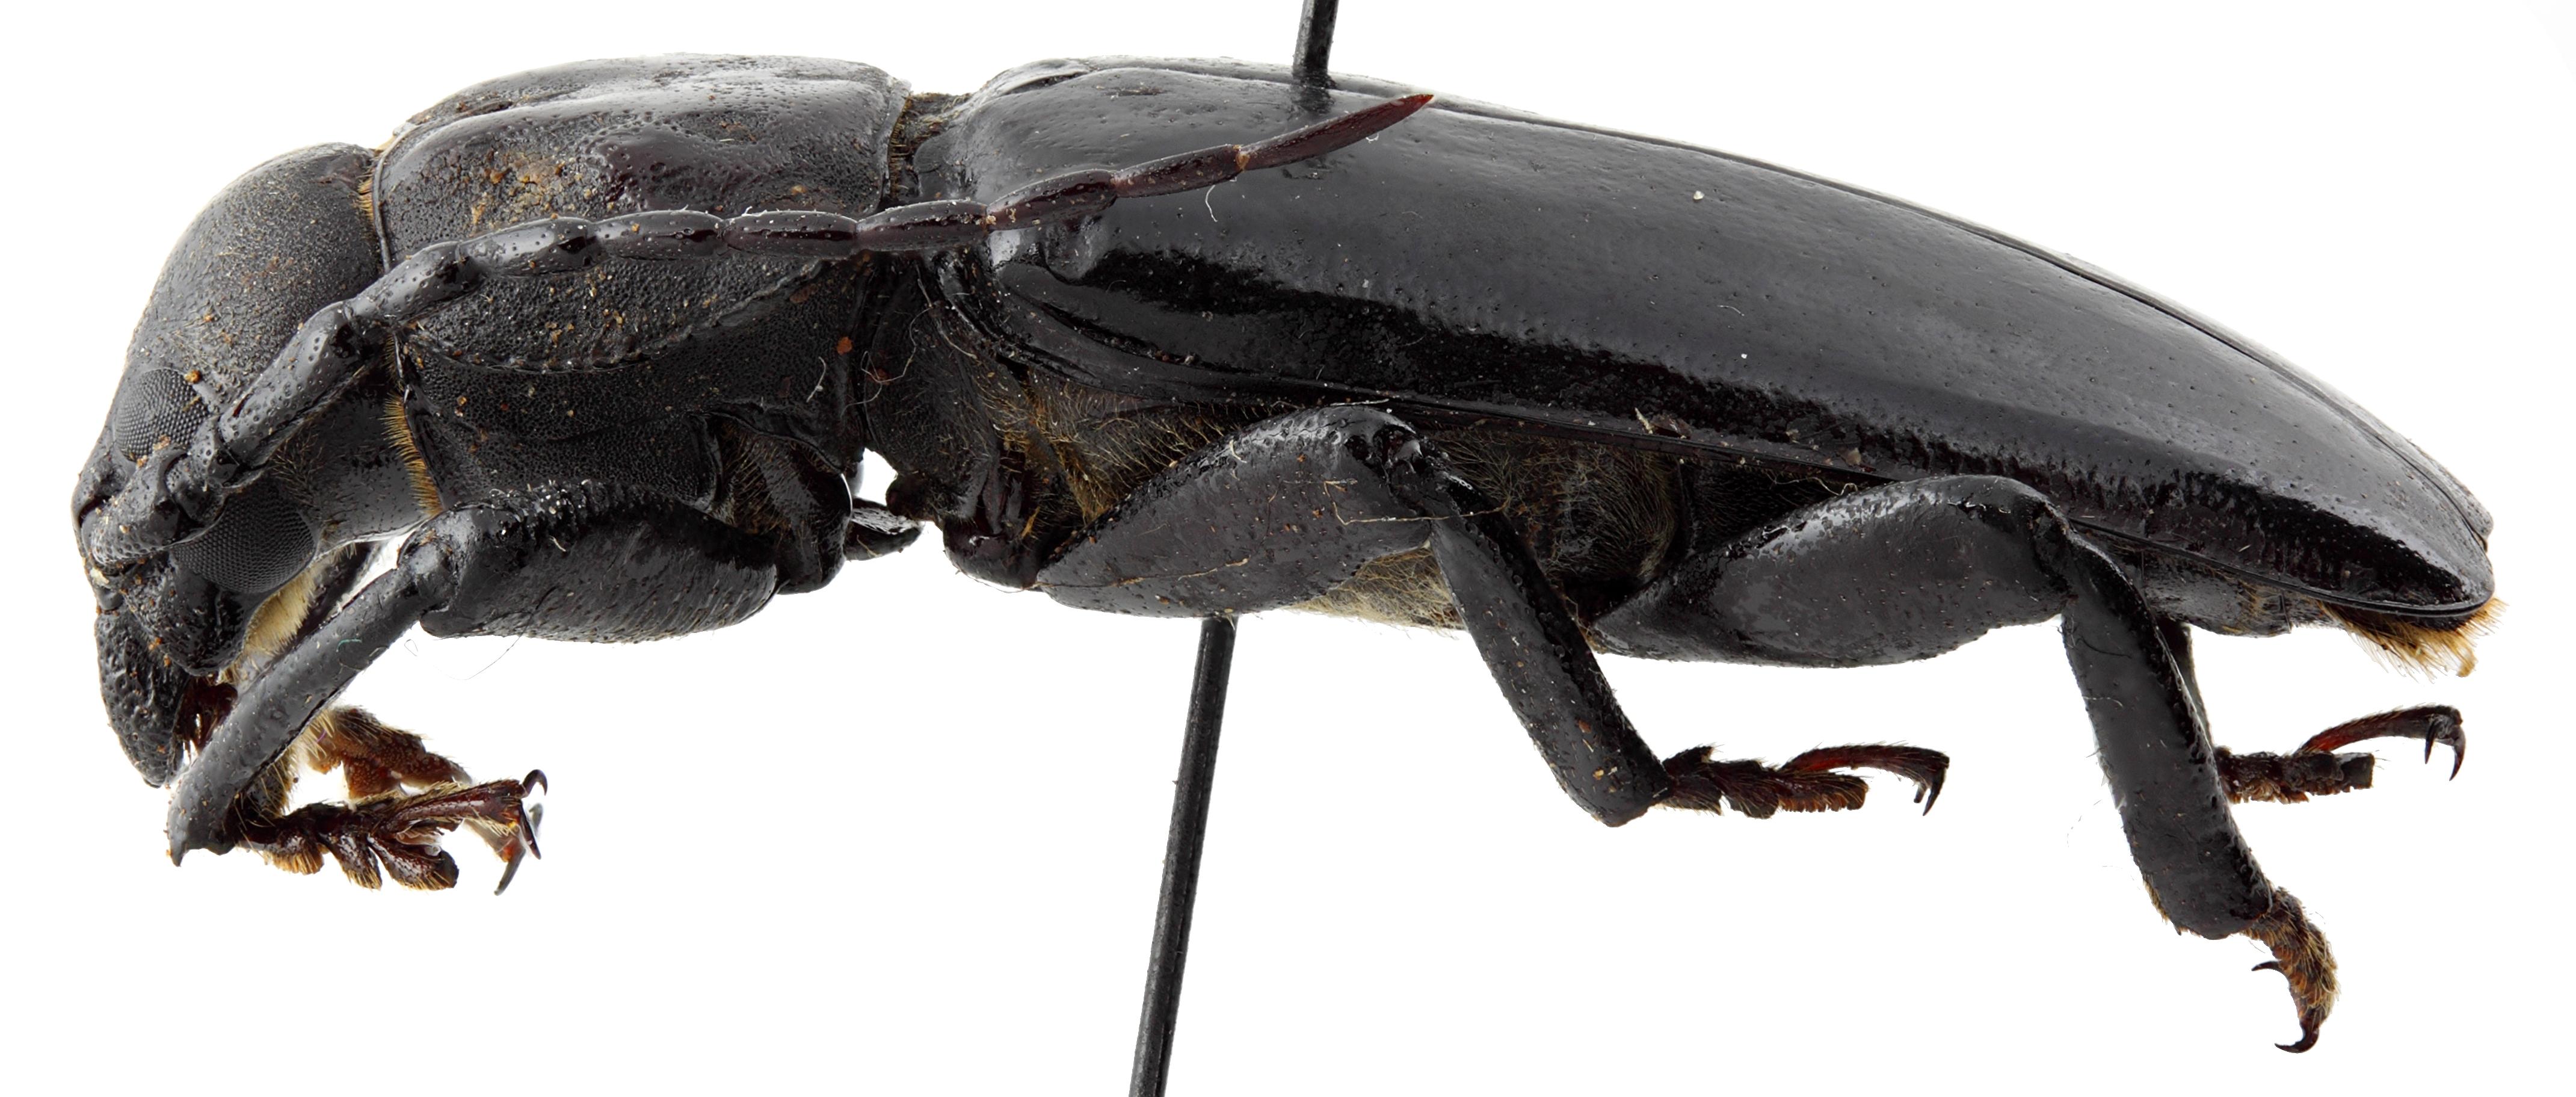 Eudianodes tanzaniensis 01 BL Holotype M 034 BRUS 201405.jpg